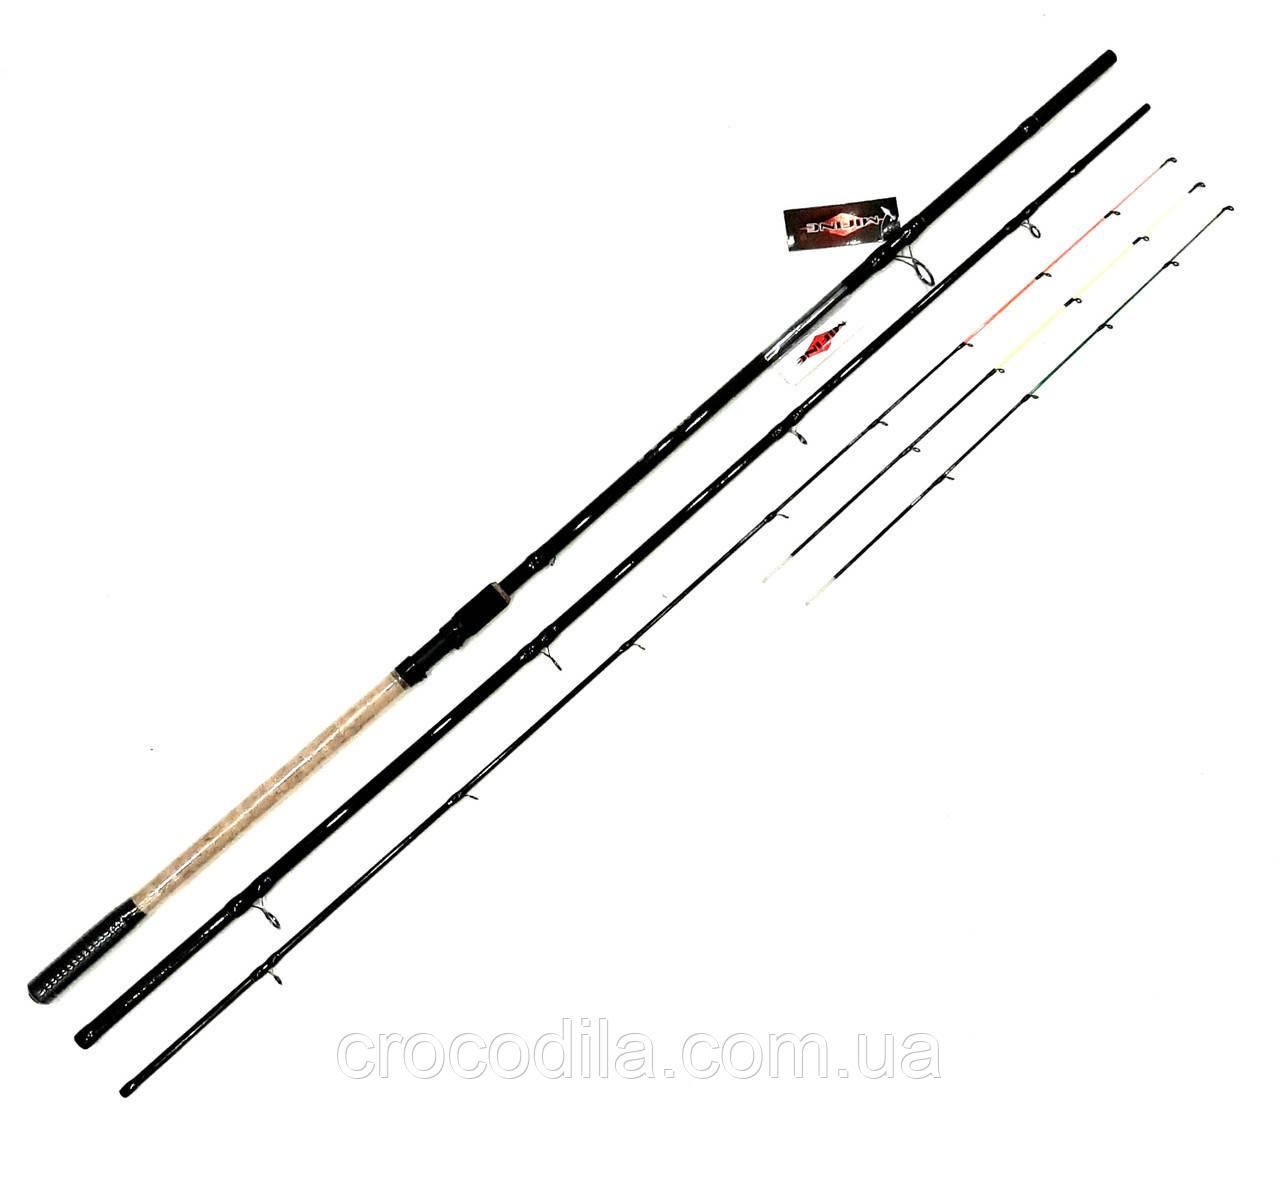 Фидерное удилище Mifine Strong Hammer 3.0 м 80/140/200 грамм